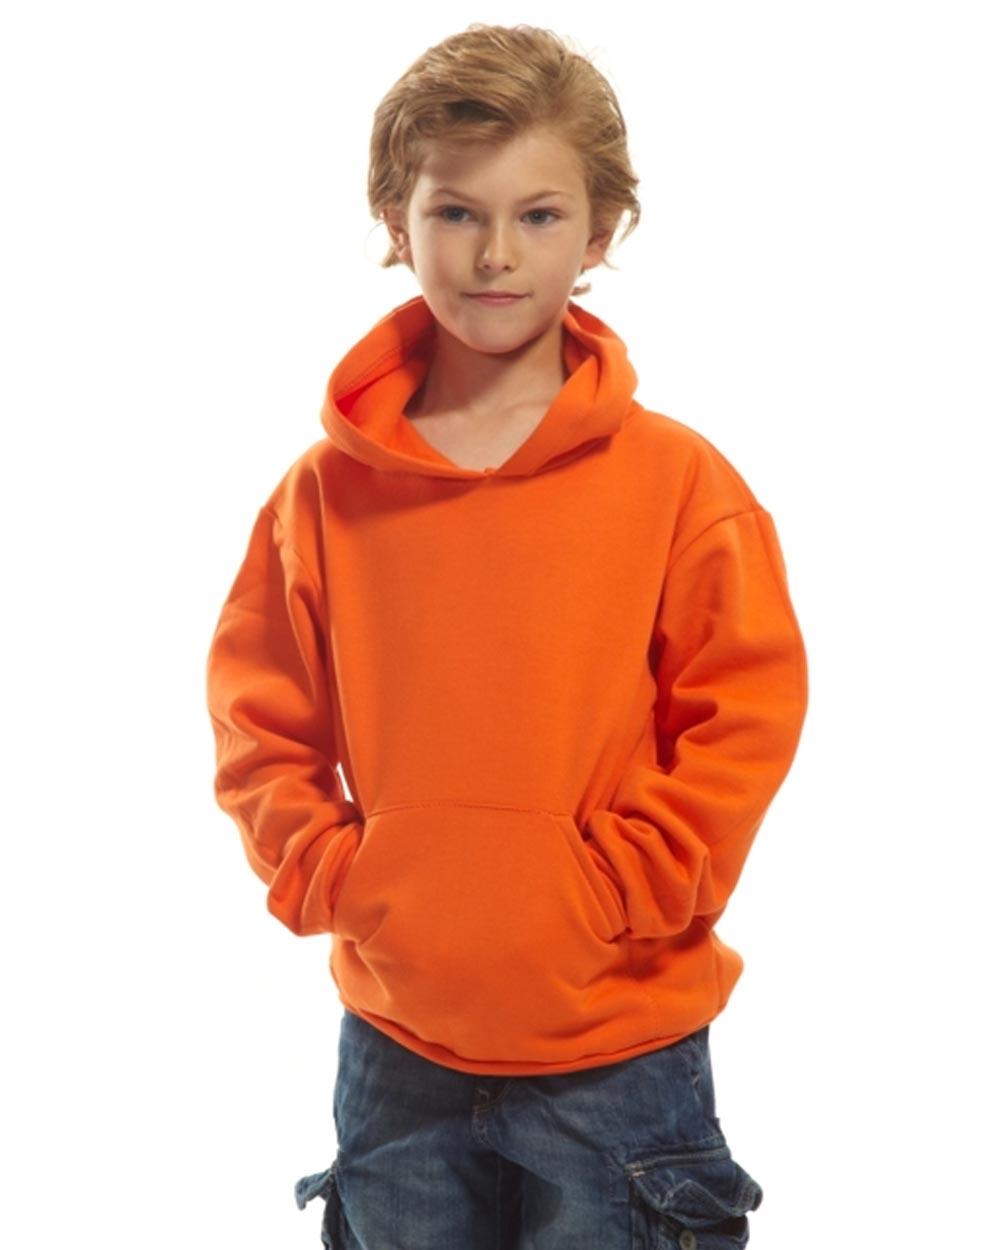 Jerico Youth Hooded Sweatshirt